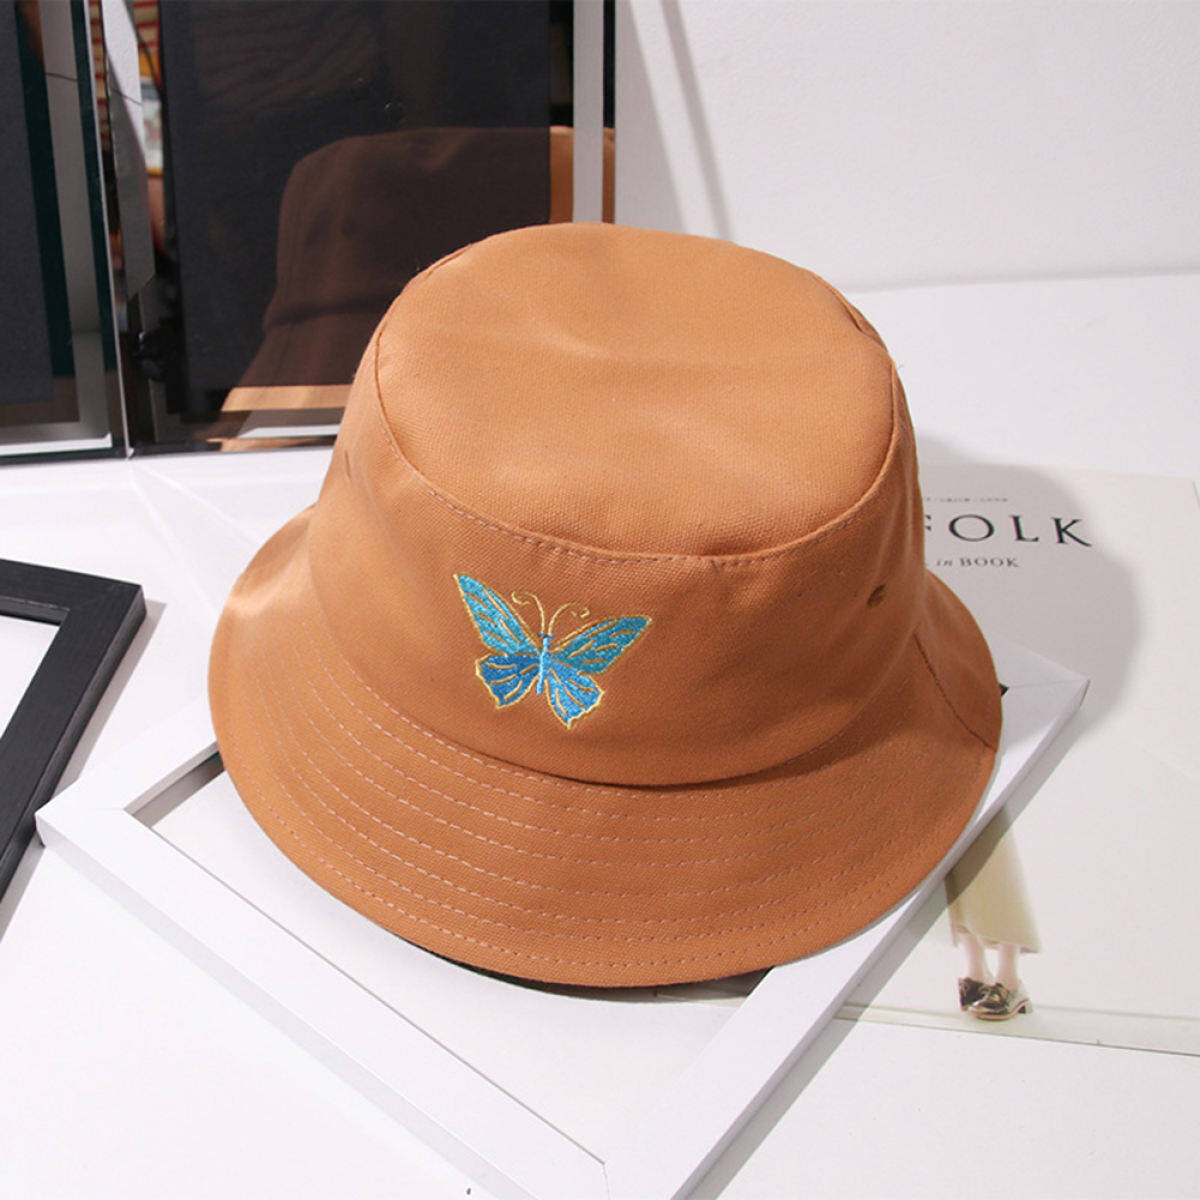 Pinfect Korean Fashion Retro Butterfly Printed Bucket Hat Women Men Summer Autumn Outdoor Travel Panama Fisherman Hip Hop Street Basin Caps Lazada